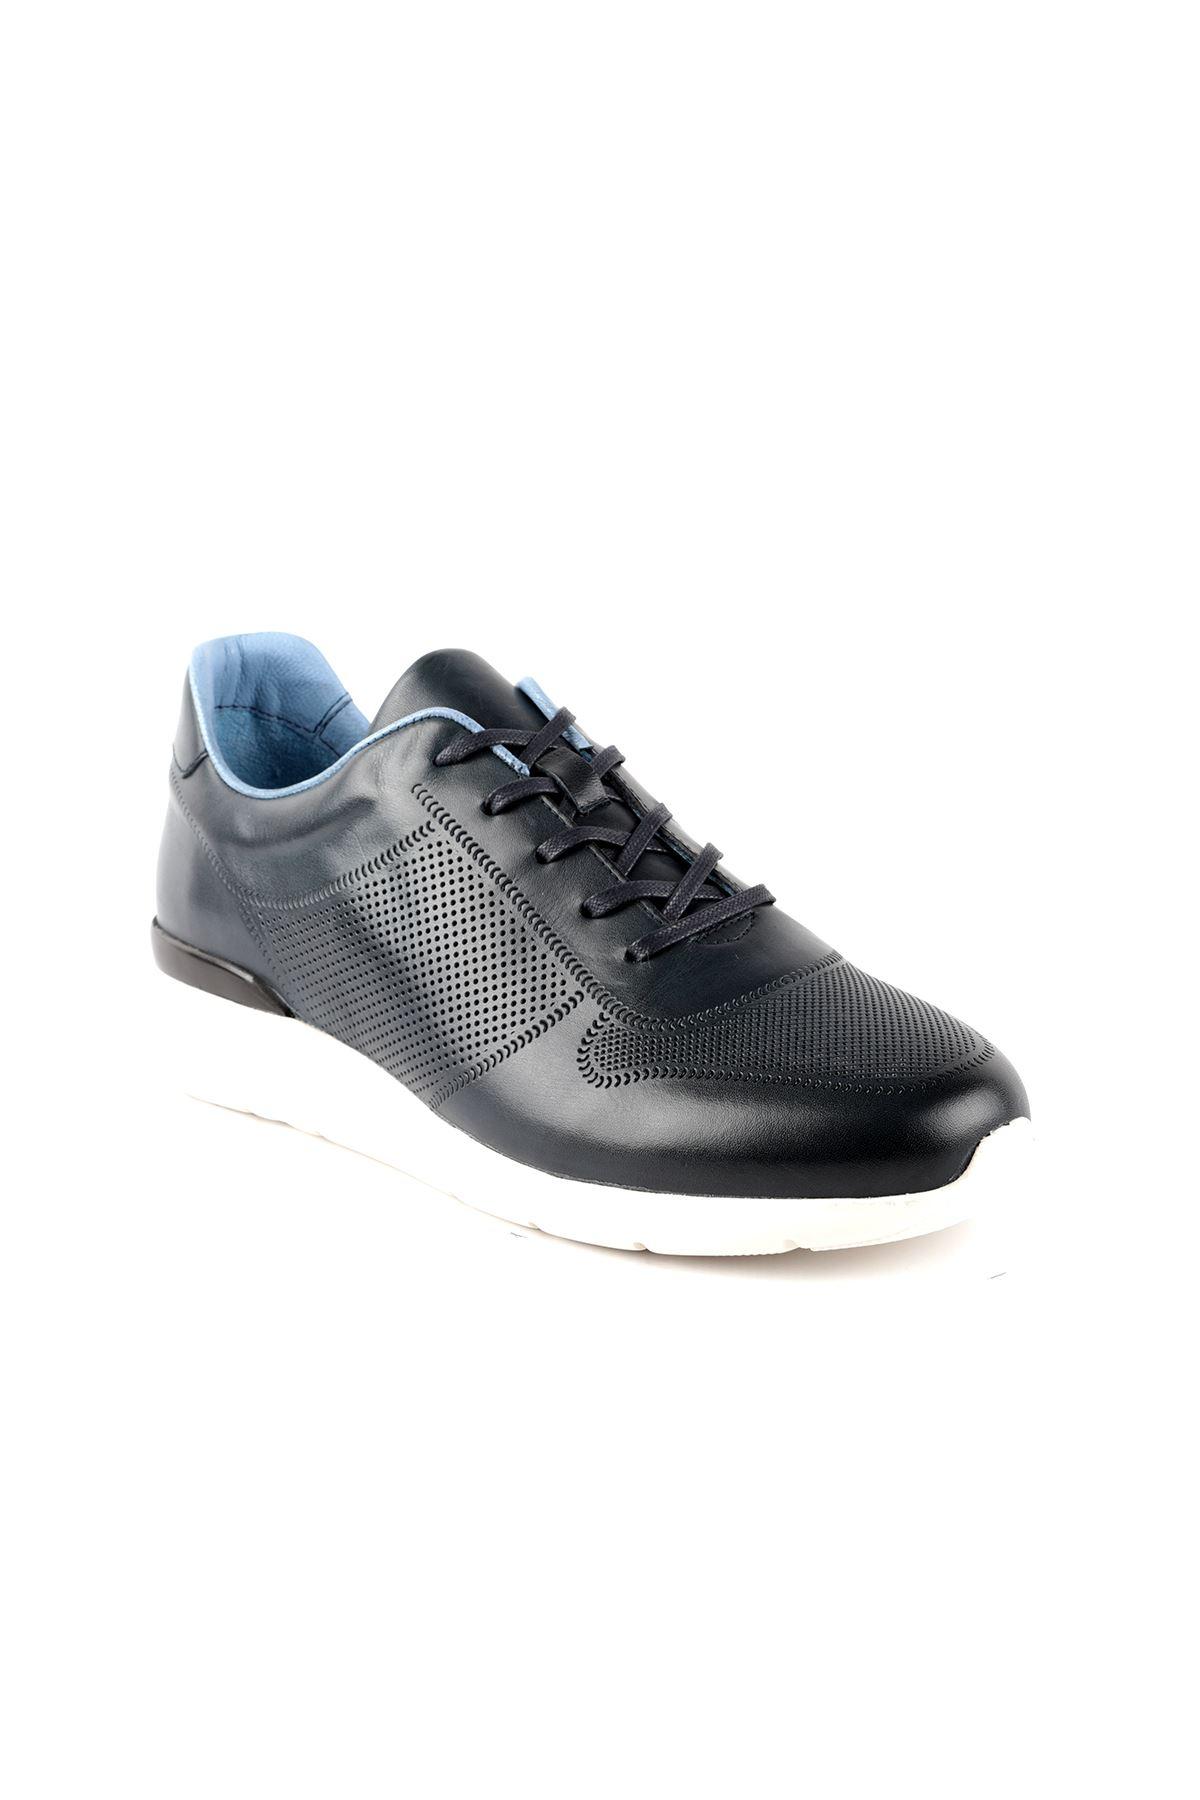 Libero L3798 Lacivert Spor Ayakkabı